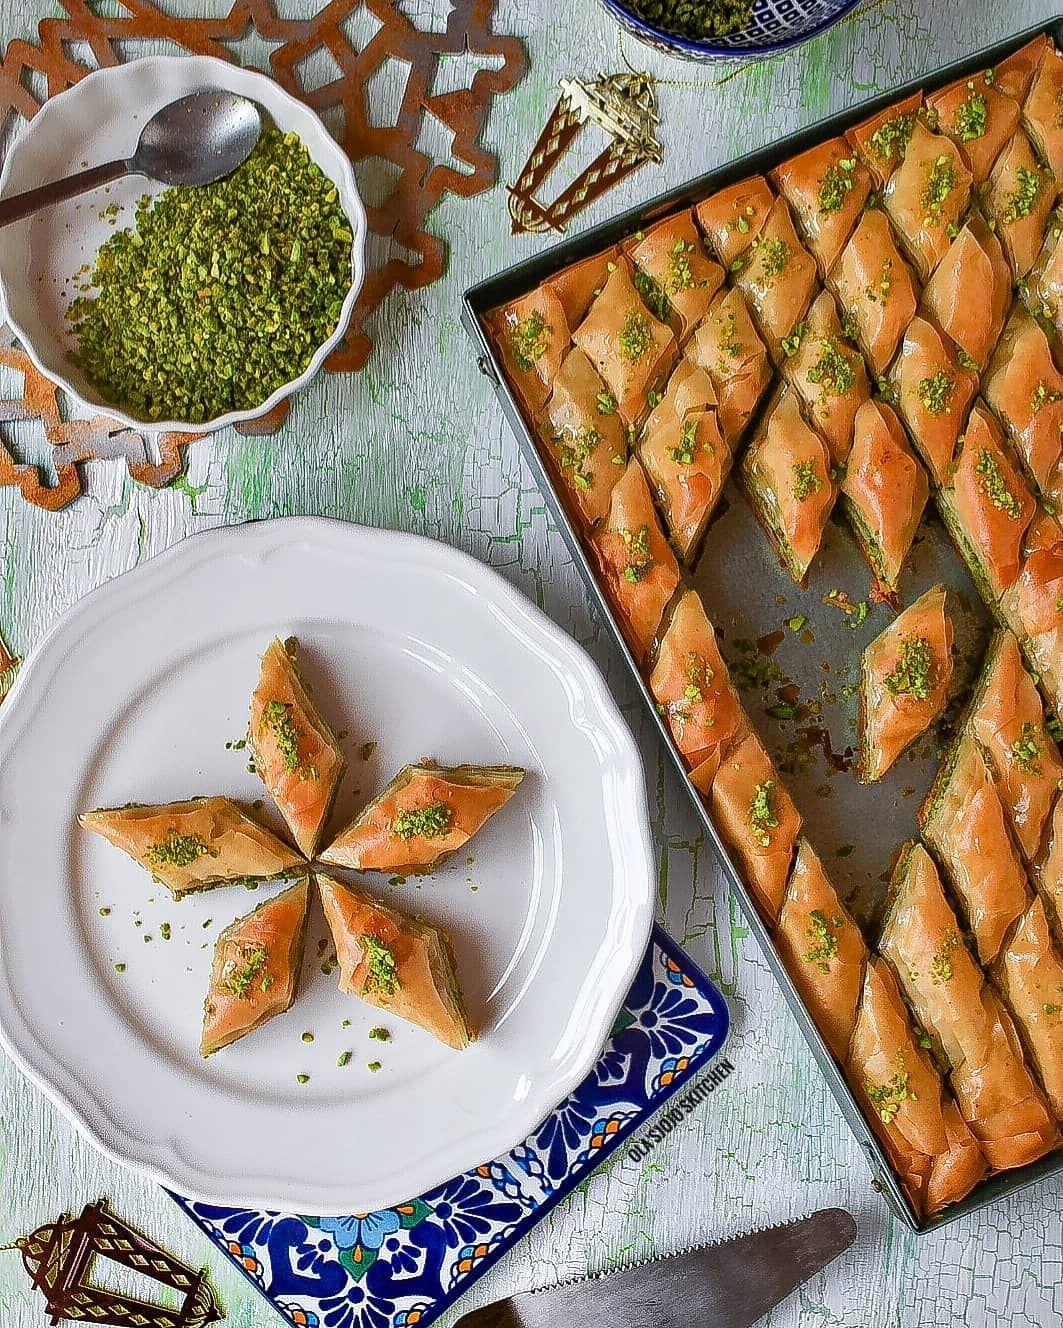 El Namleya النملية On Instagram بقلاوة بالفستق تقديم علا حسني Olas Jojos Kitchen البقلاوة بشكلها المتعارف عليه المكونة من ط Lebanese Recipes Food Cuisine